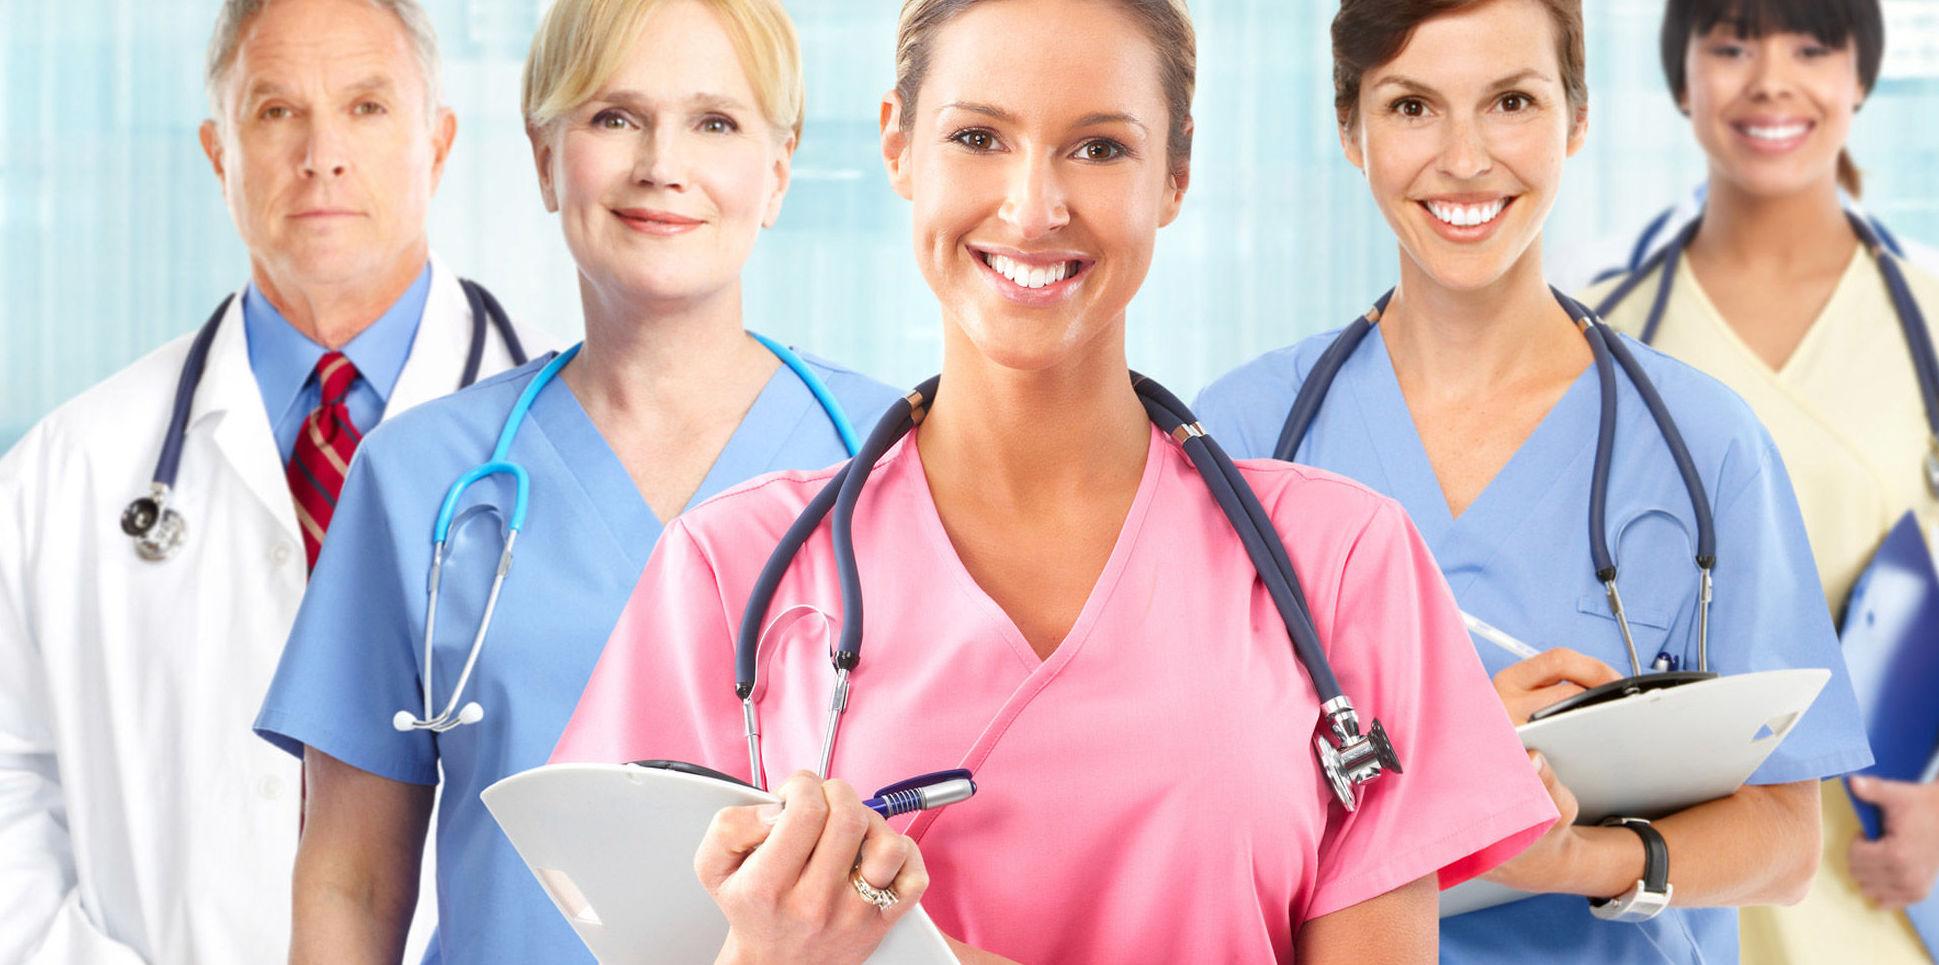 Sanitarios: Catálogo de Álvaro Uniformes